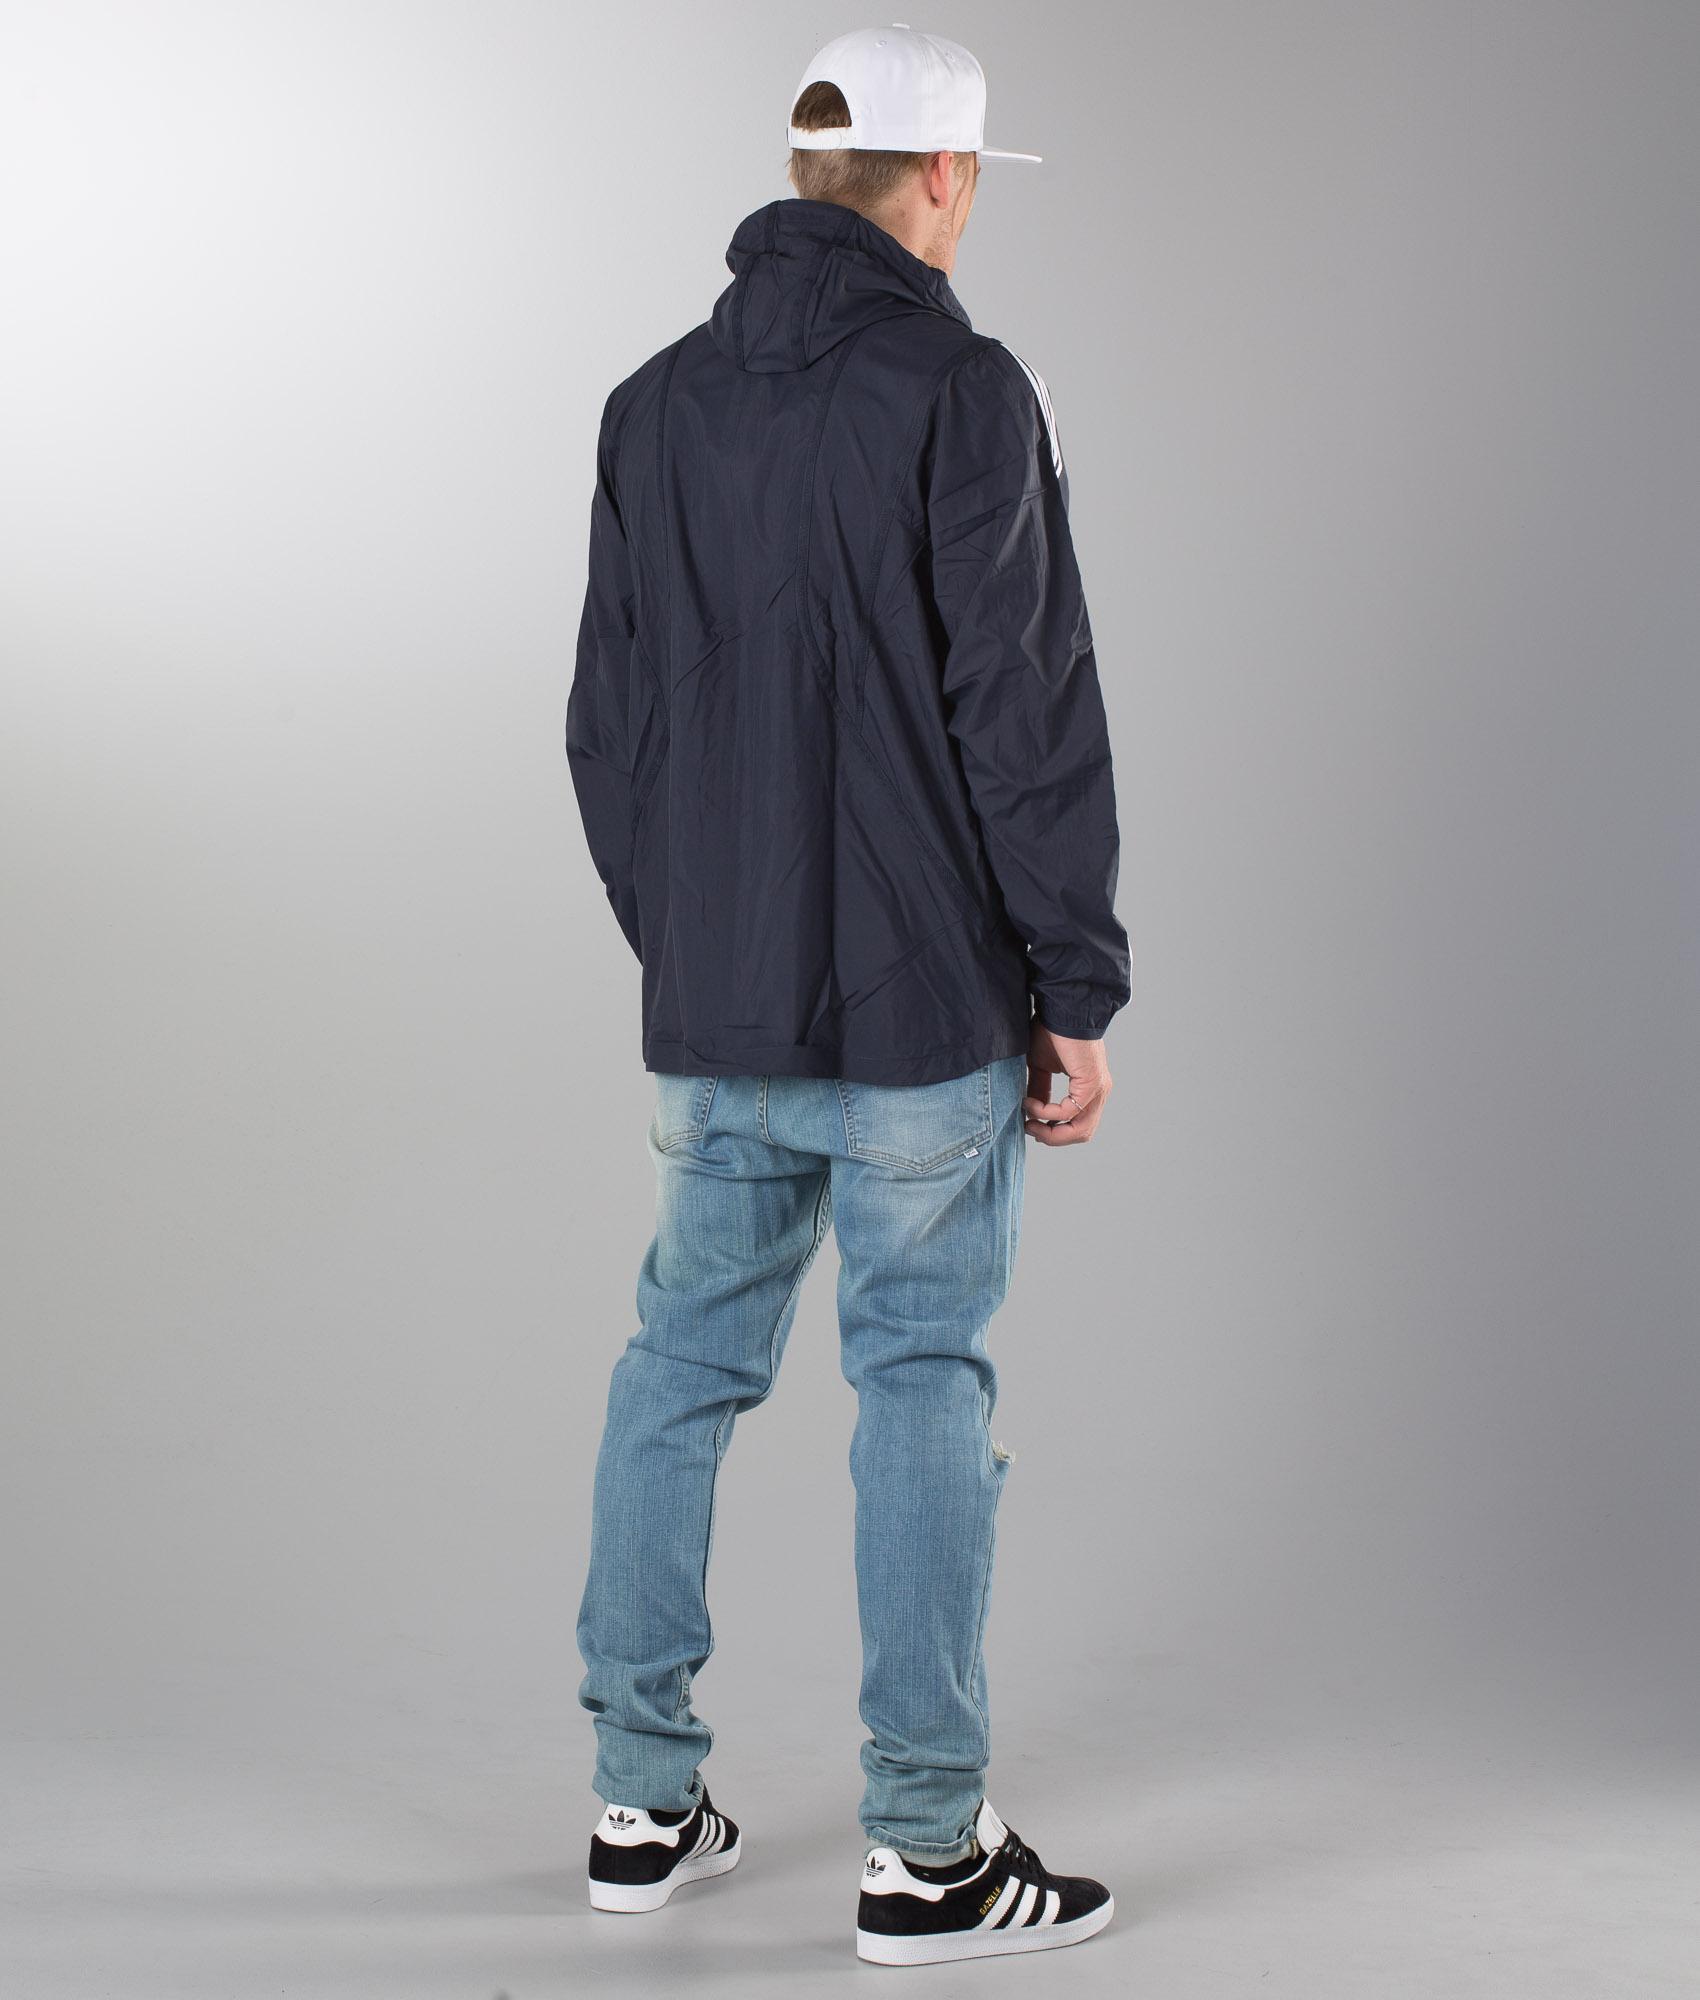 Adidas Originals Tko Clr84 Jacke LeginkWhite